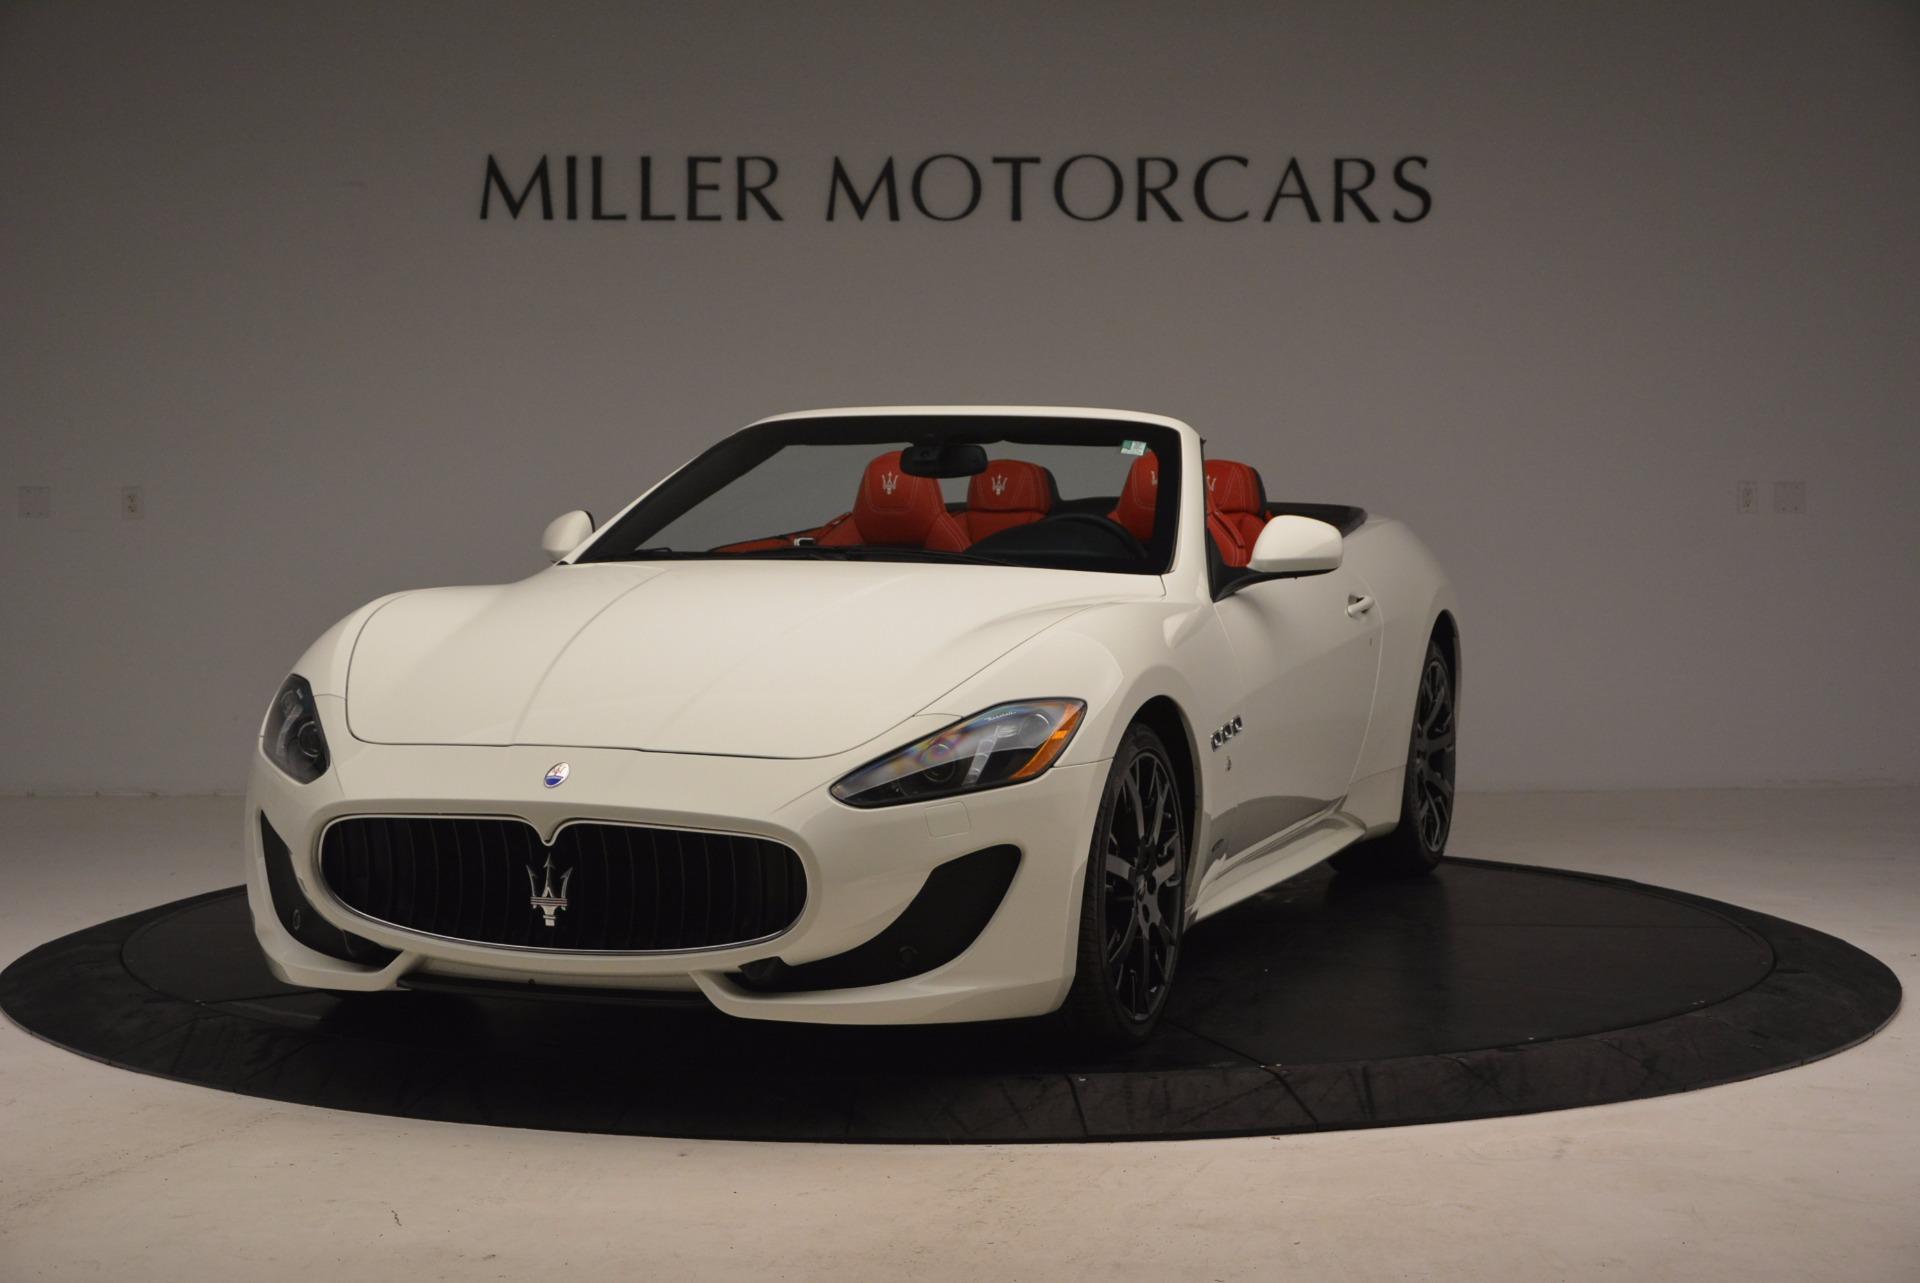 Used 2016 Maserati GranTurismo Sport for sale Sold at McLaren Greenwich in Greenwich CT 06830 1